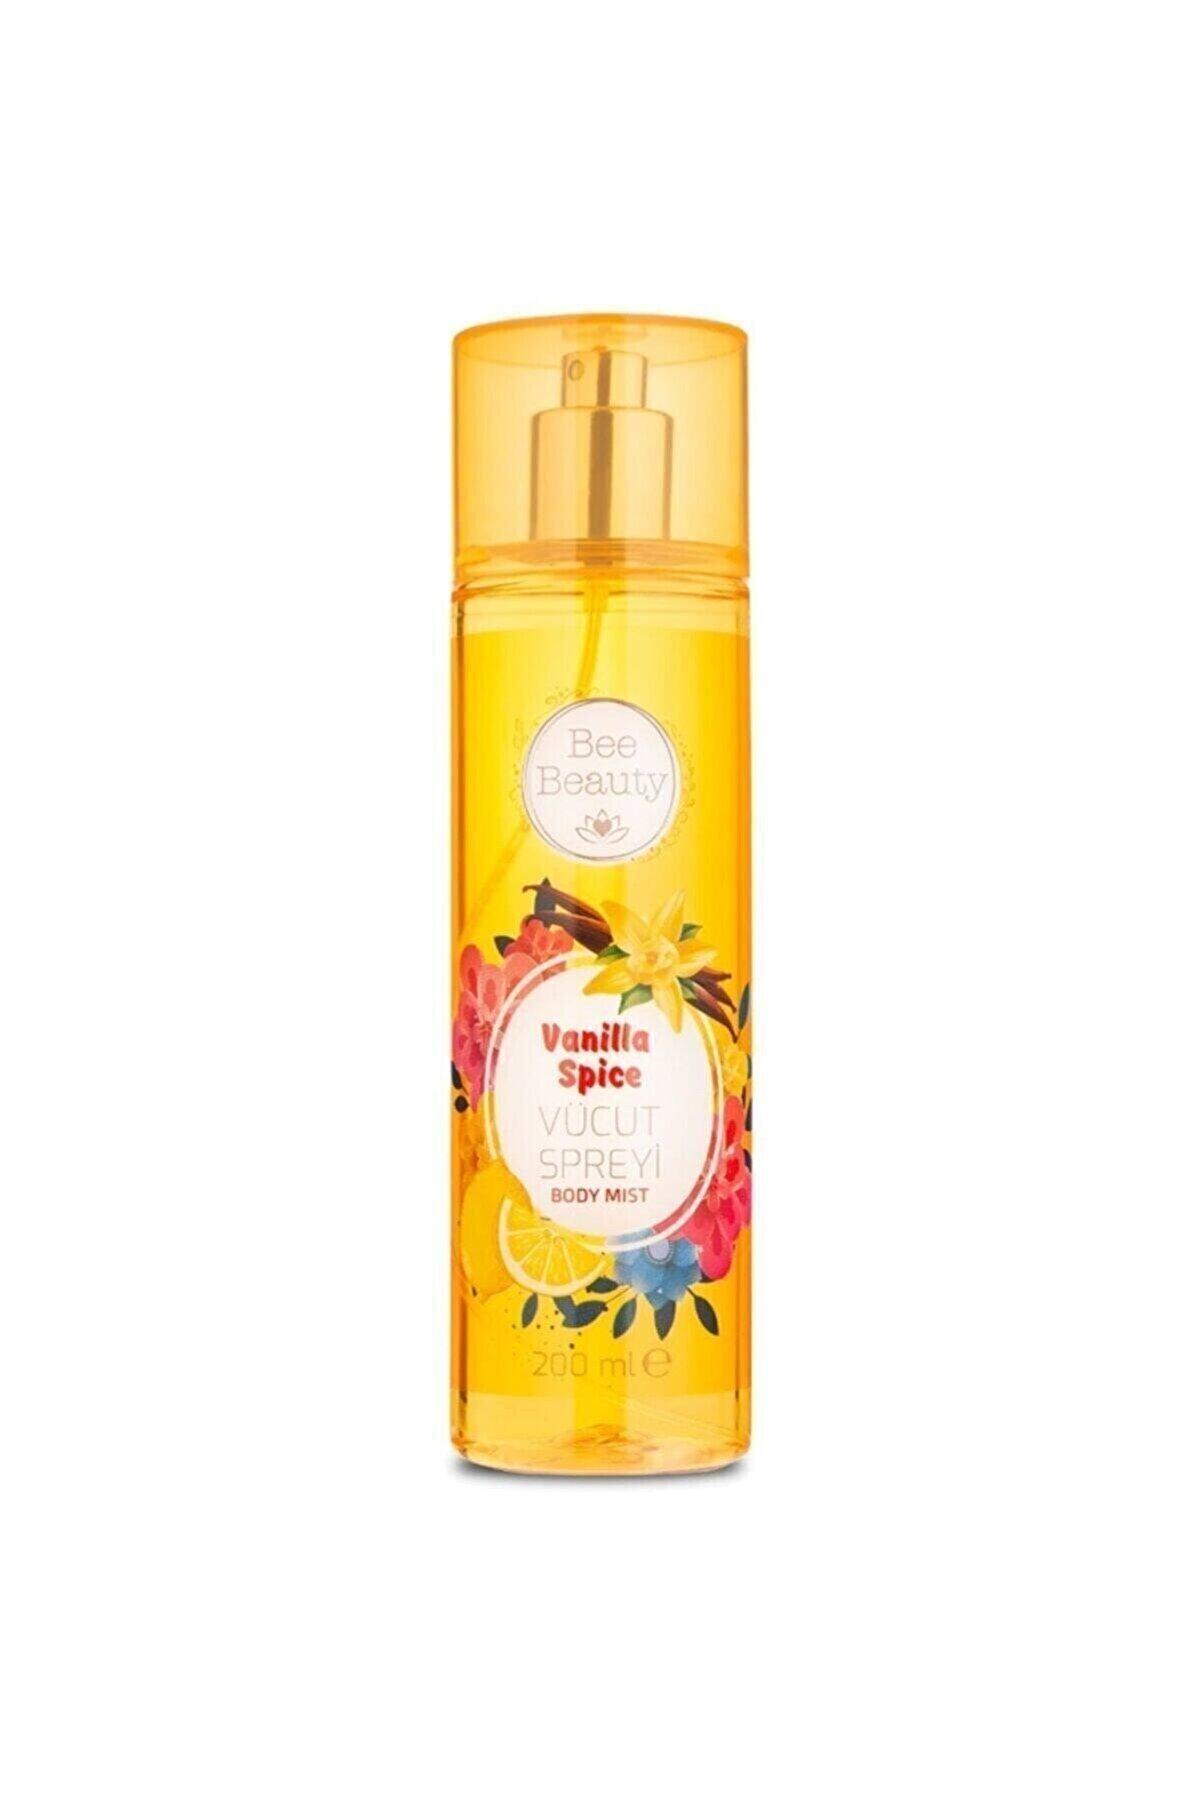 Bee Beauty Vanilla Spice Vücut Spreyi 200 ml